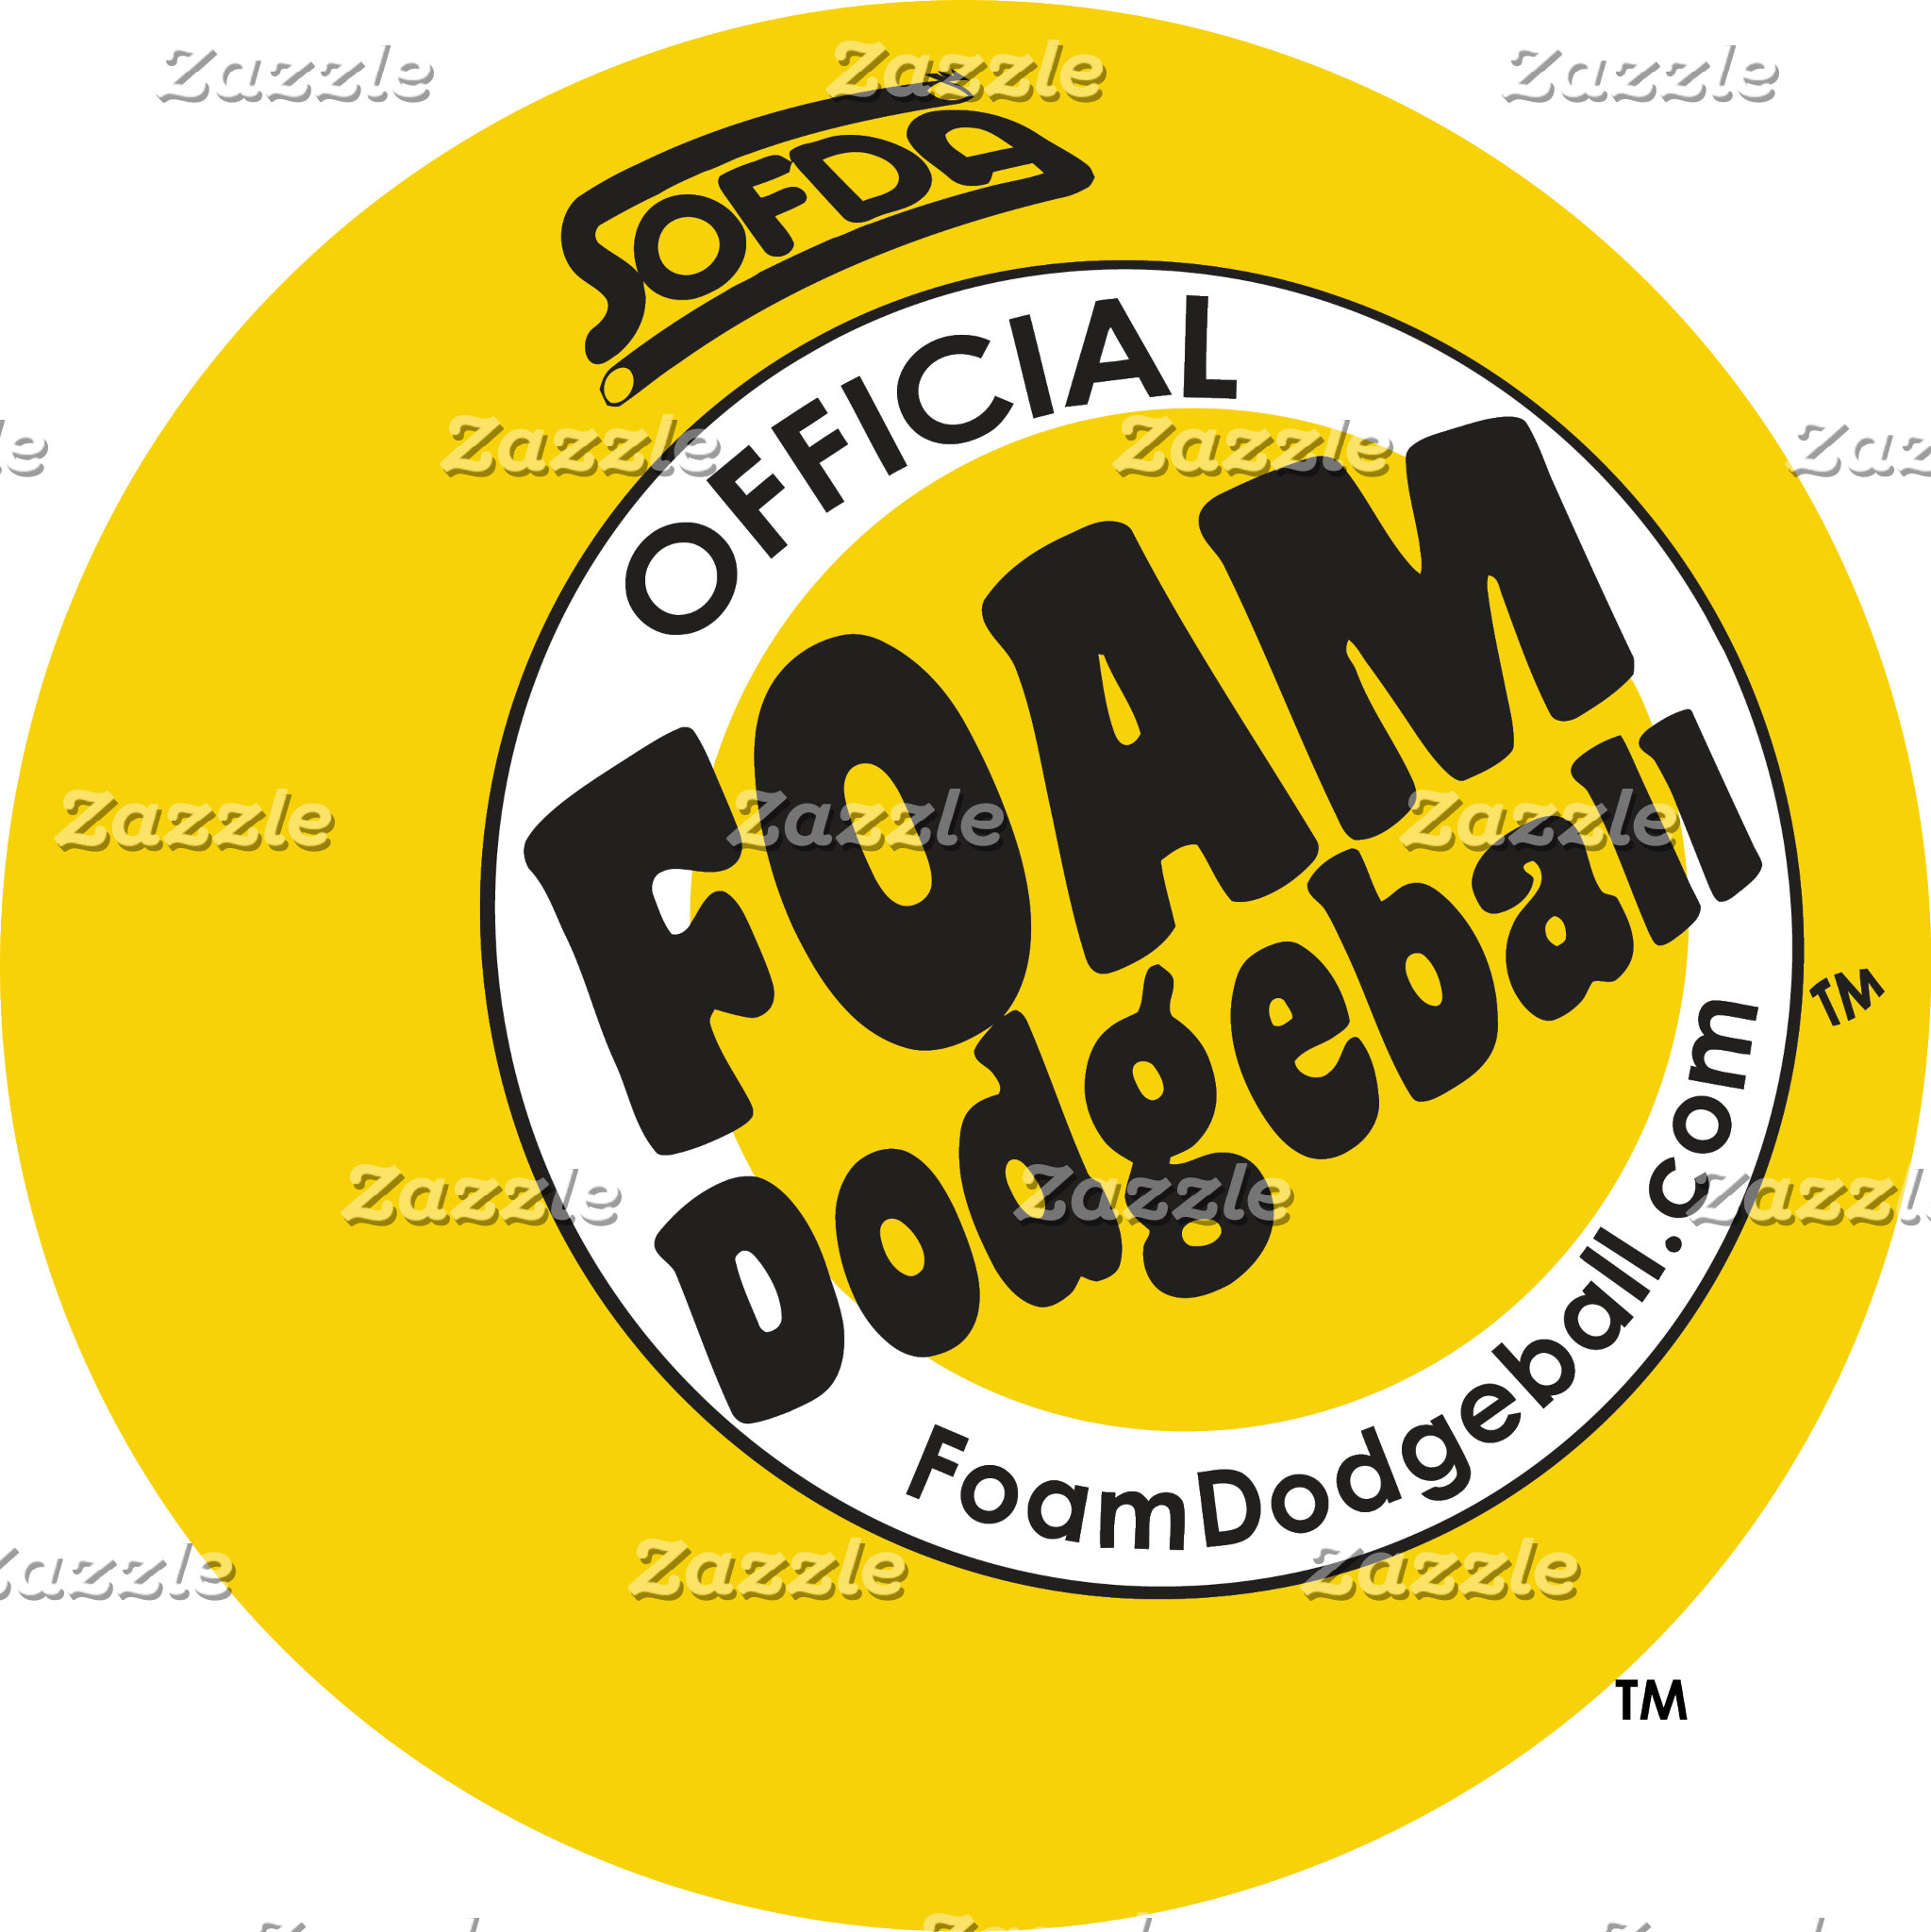 Foam Dodgeball Logo Items